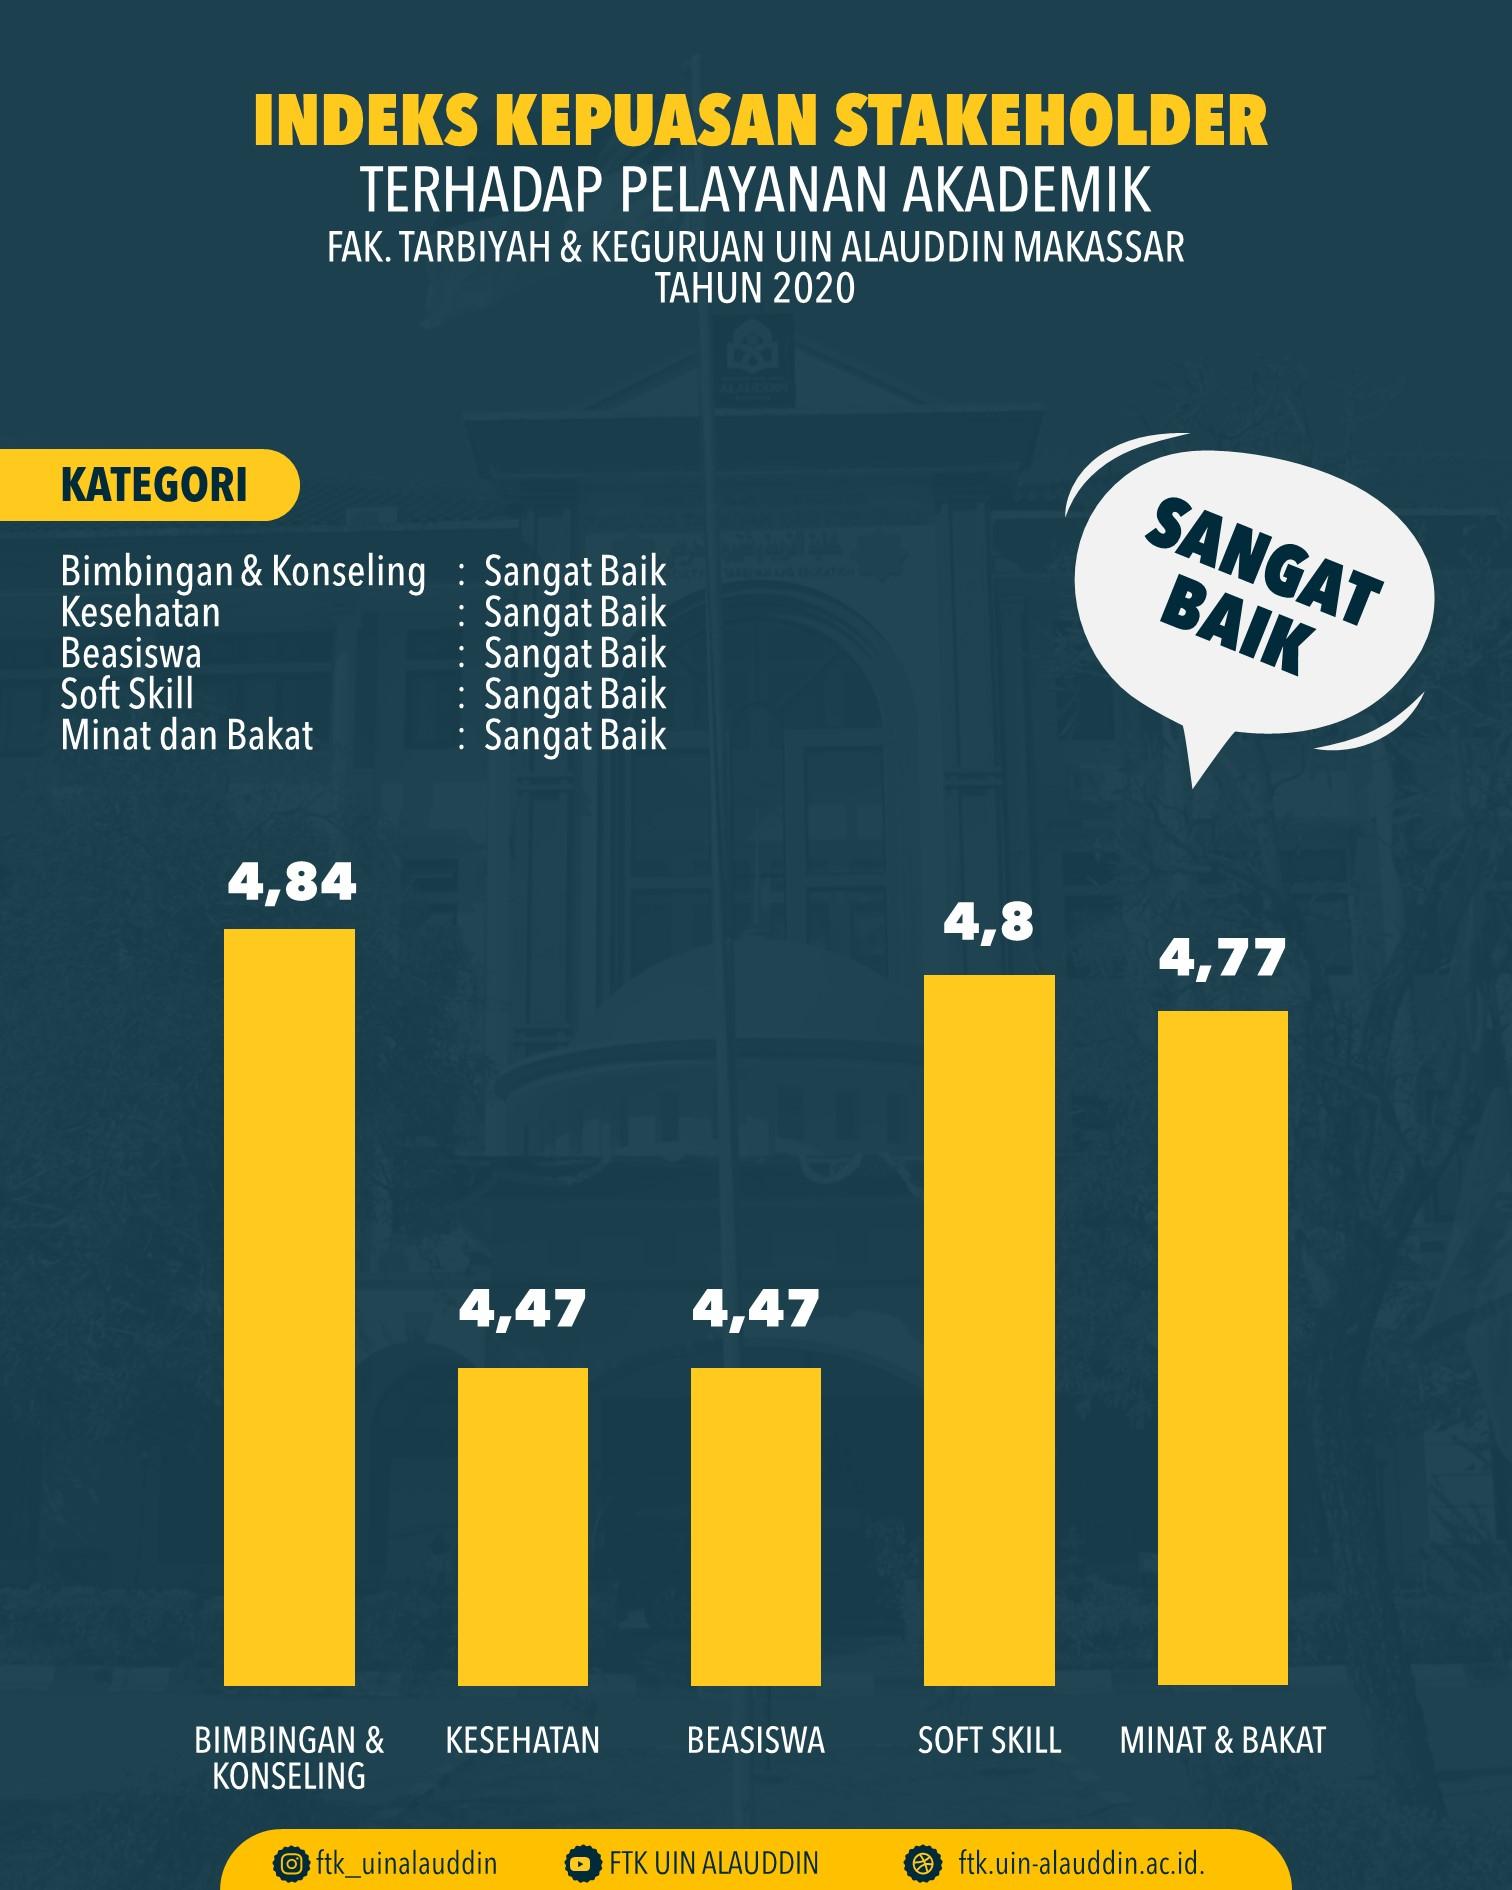 Indeks Kepuasan Stakeholder terhadap pelayanan akademik